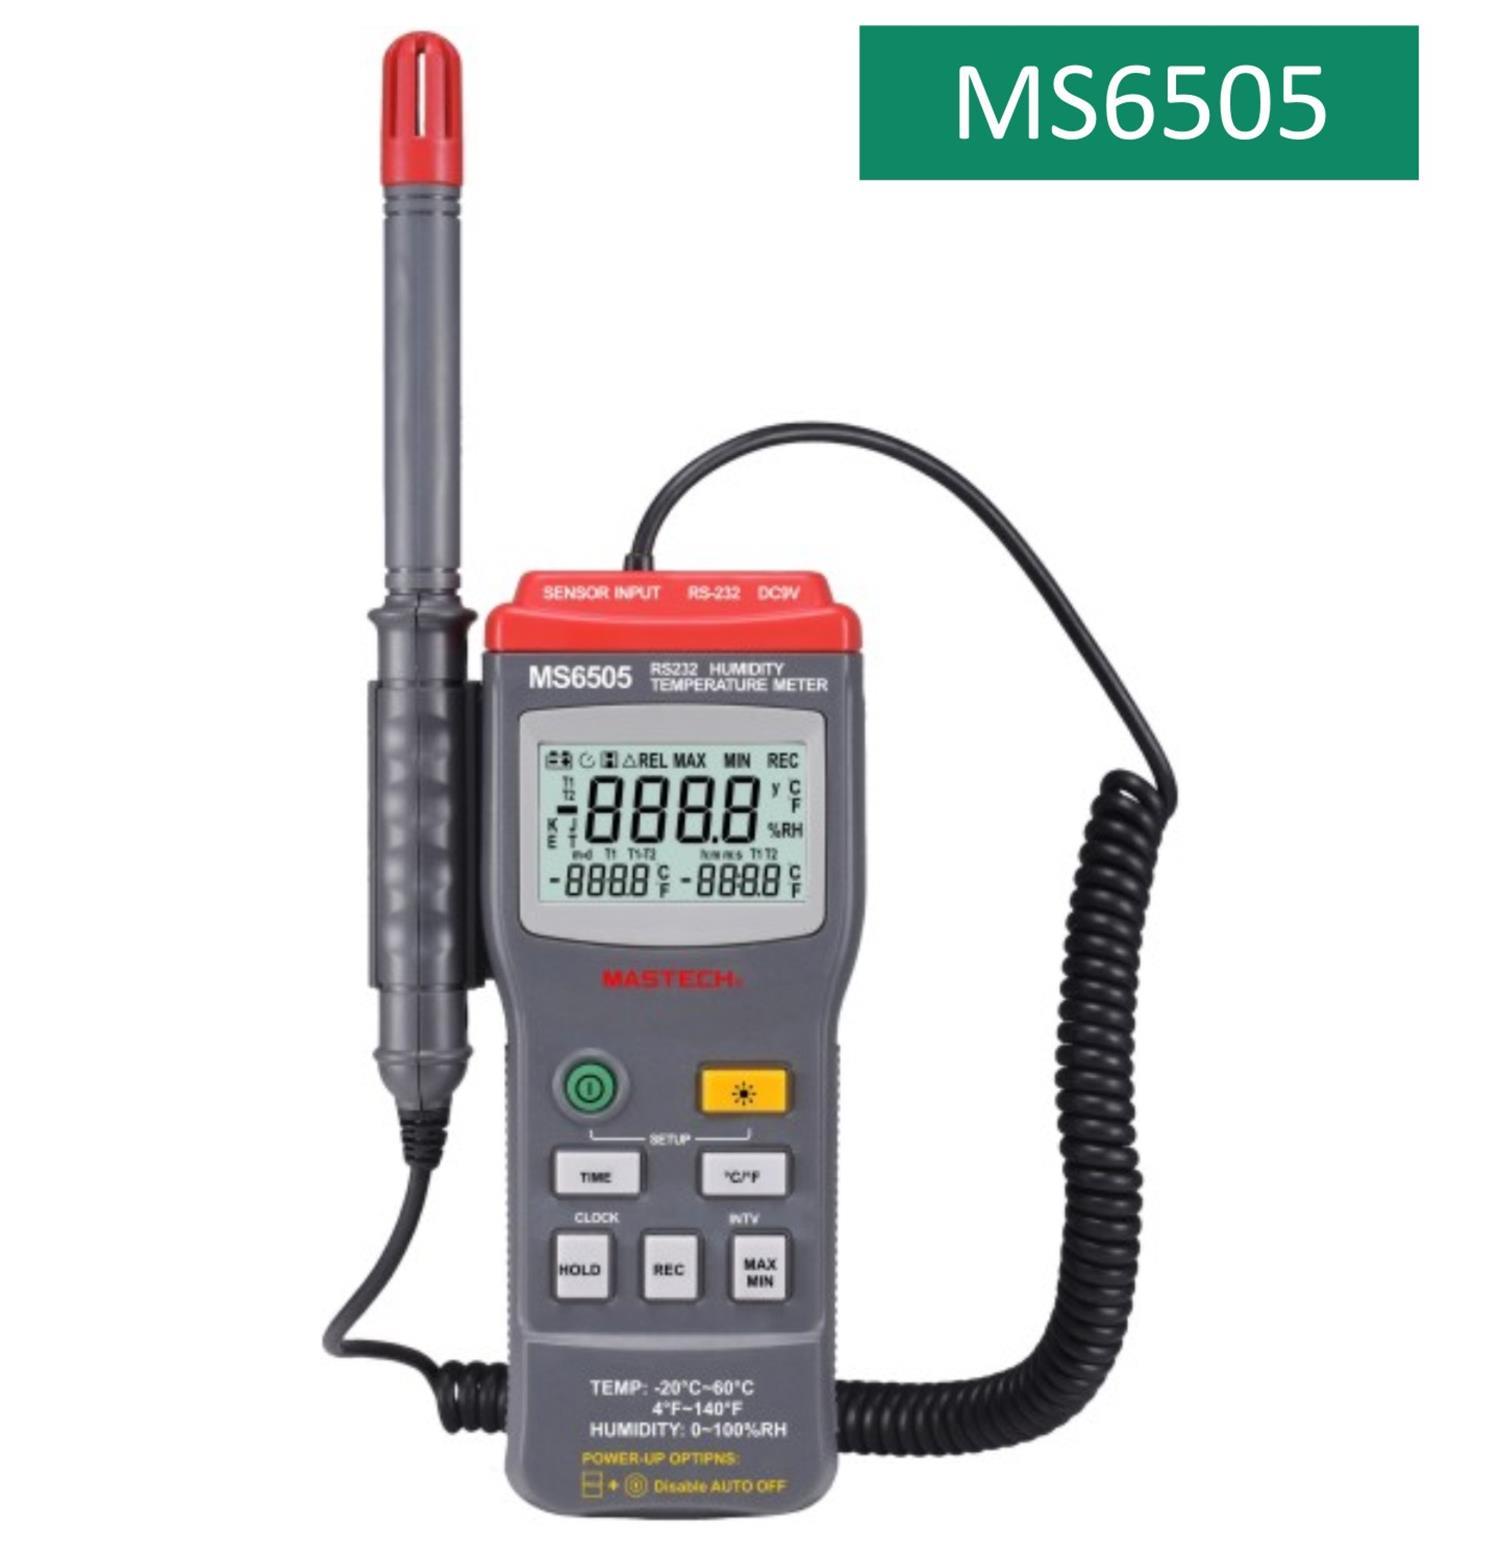 MS 6505